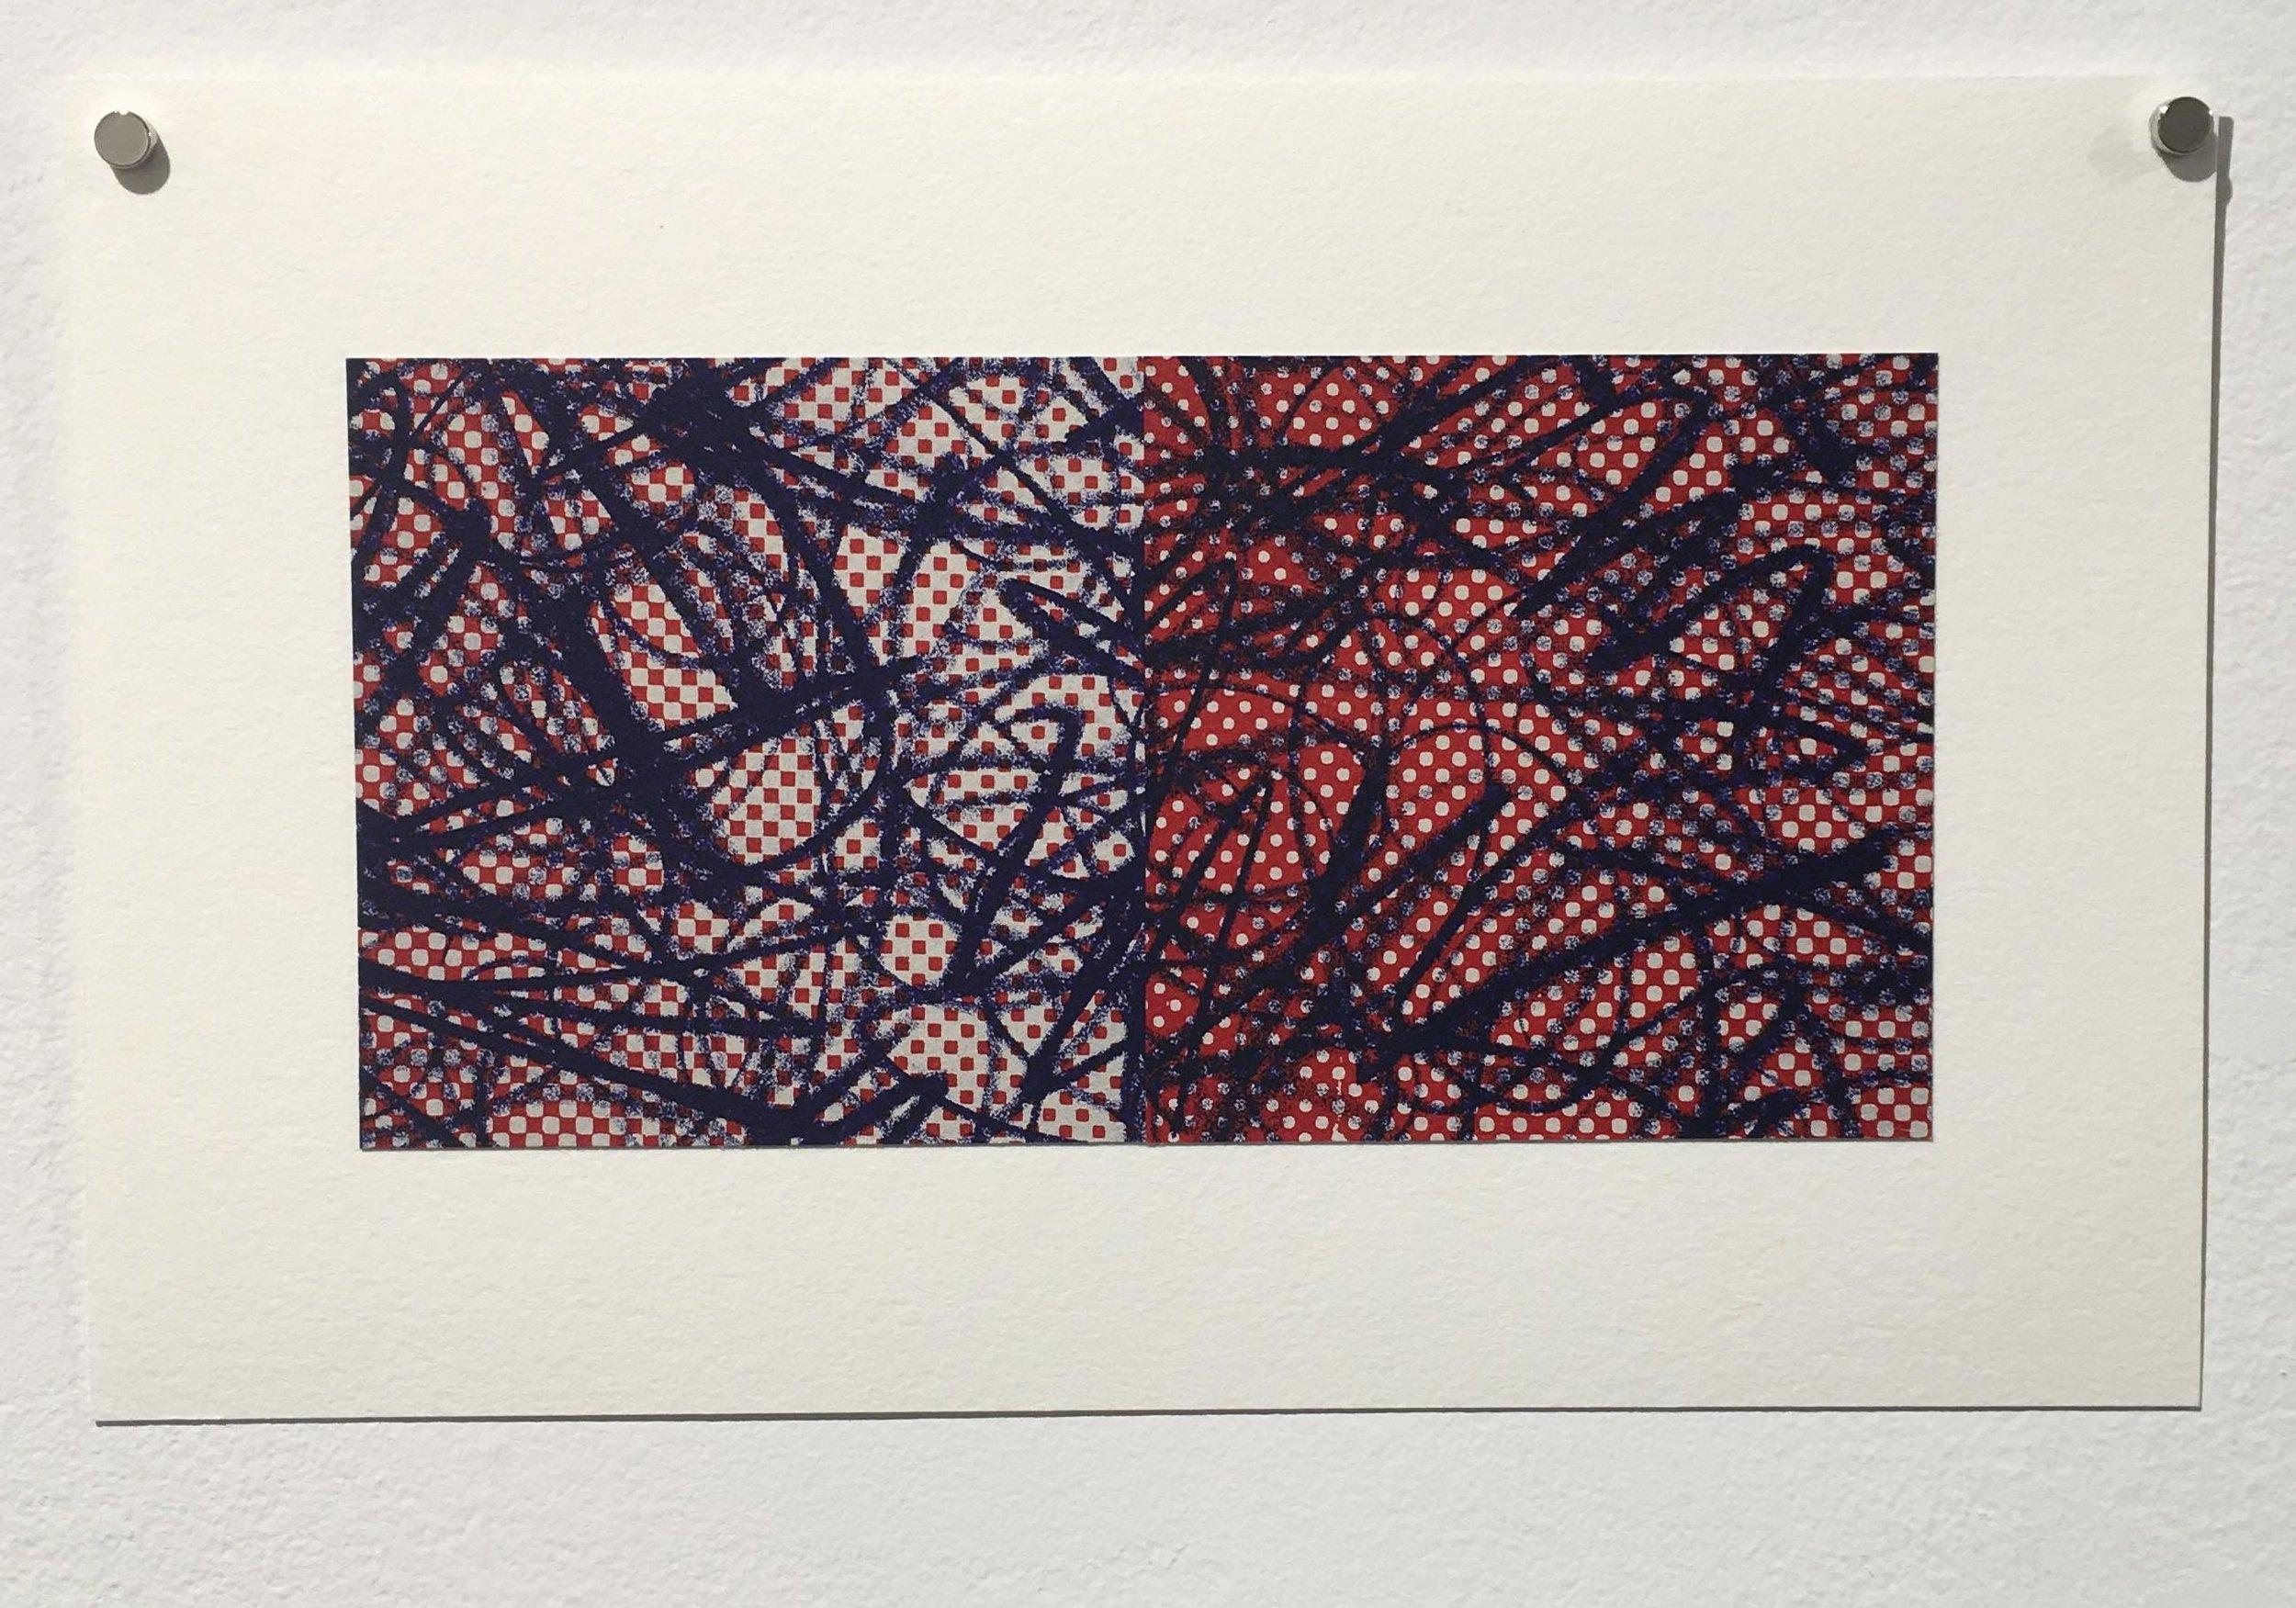 Third Prize – Ryan Laidman, No Order (2016), waterless lithography